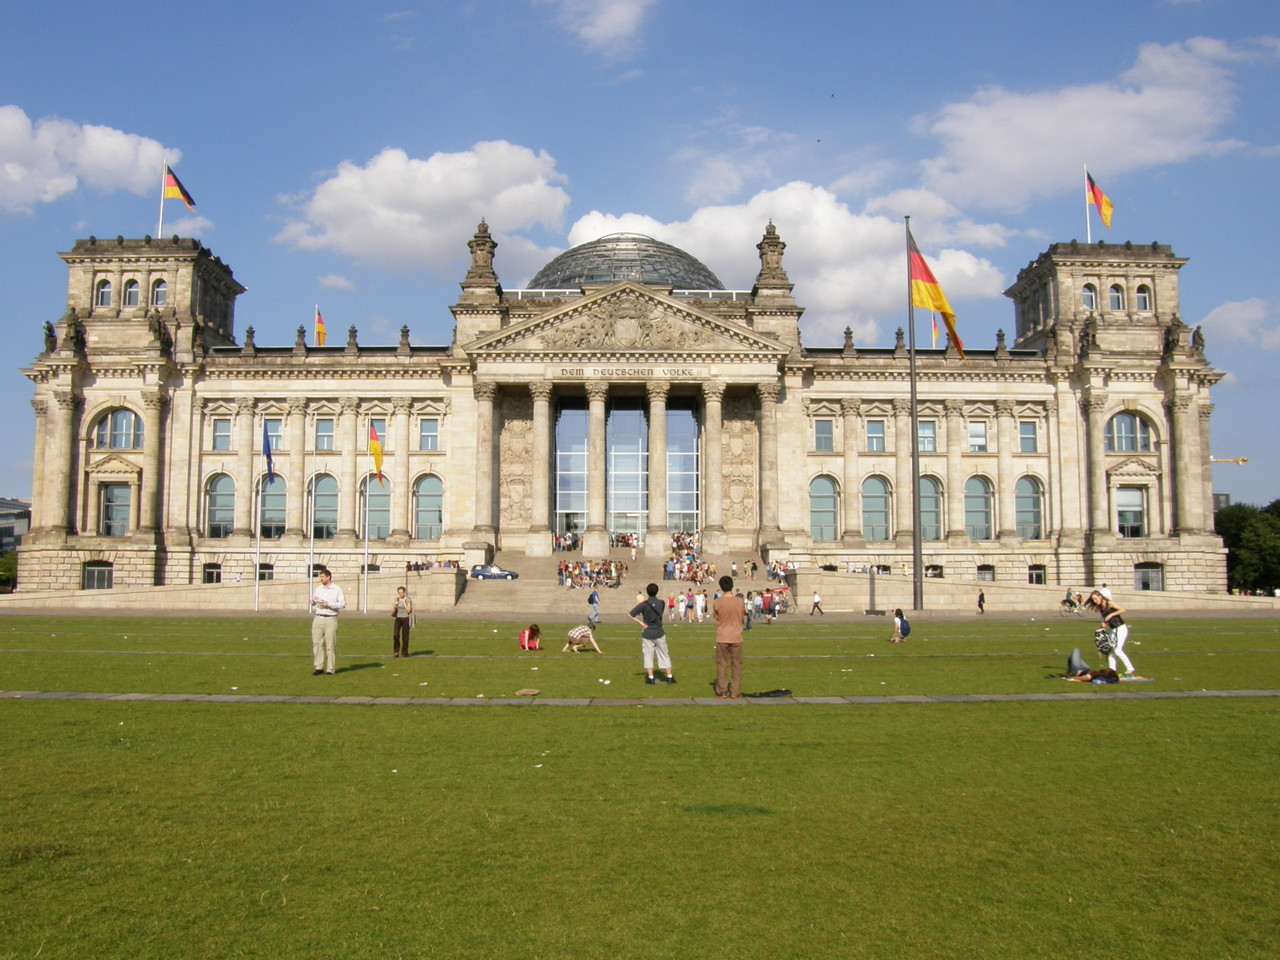 Anschließend zum Reichstagsgebäude, dem Domizil des Bundtags: